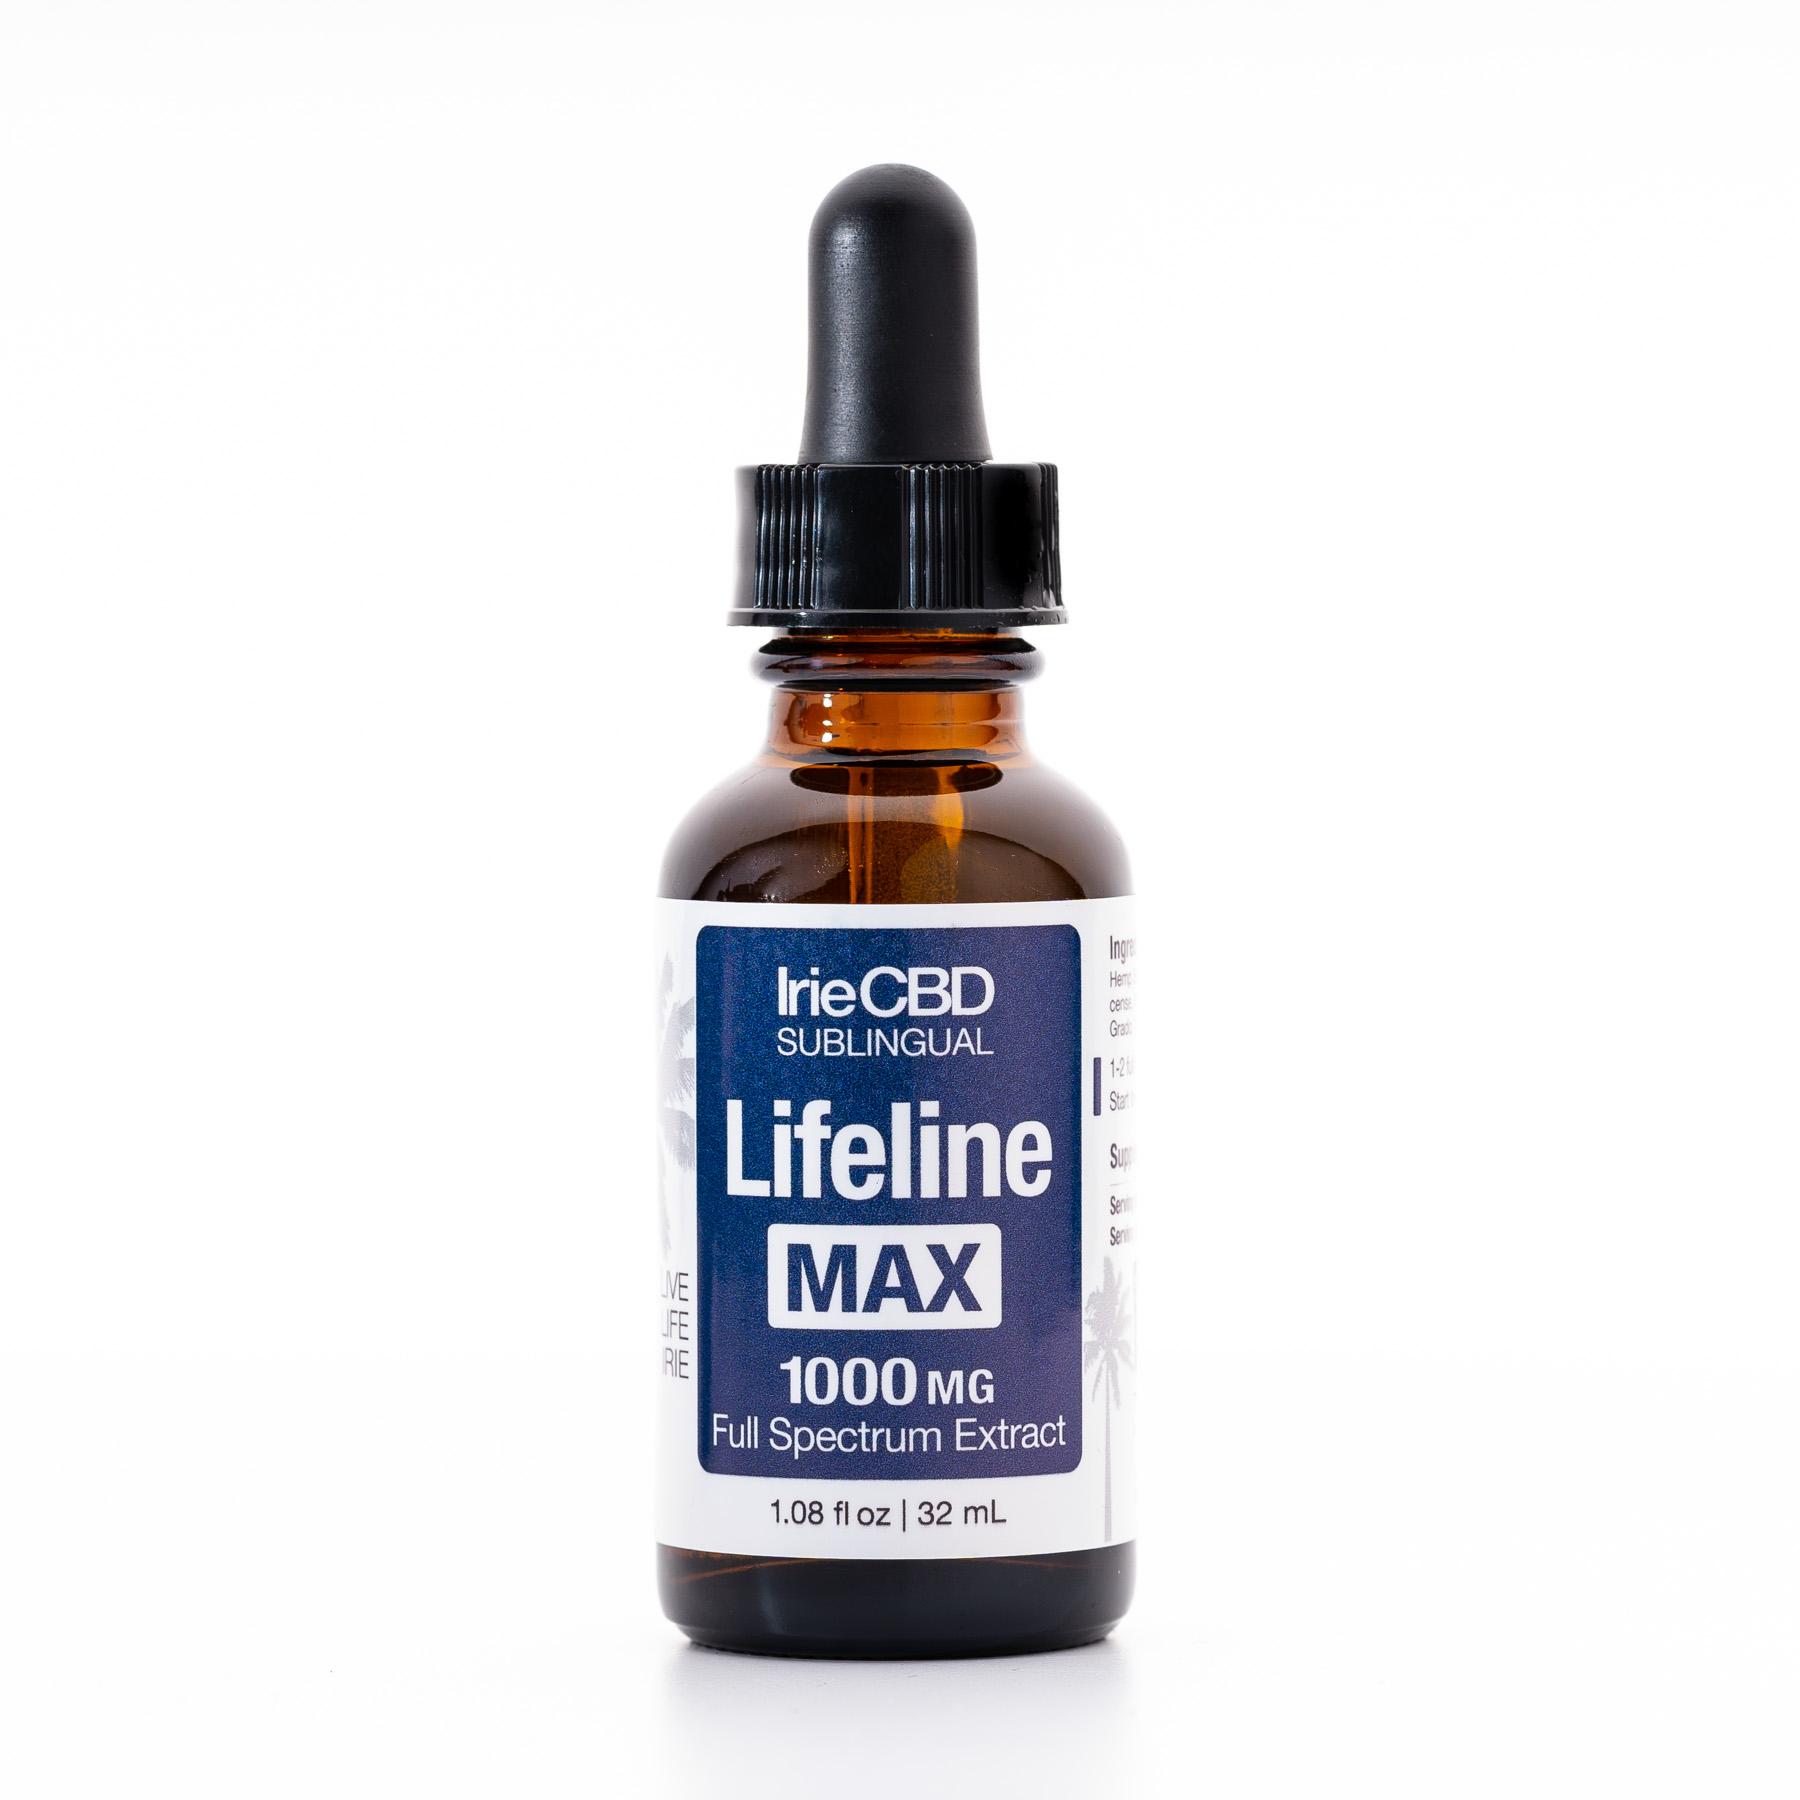 Lifeline Max 1000mg CBD Oil Tincture Irie CBD